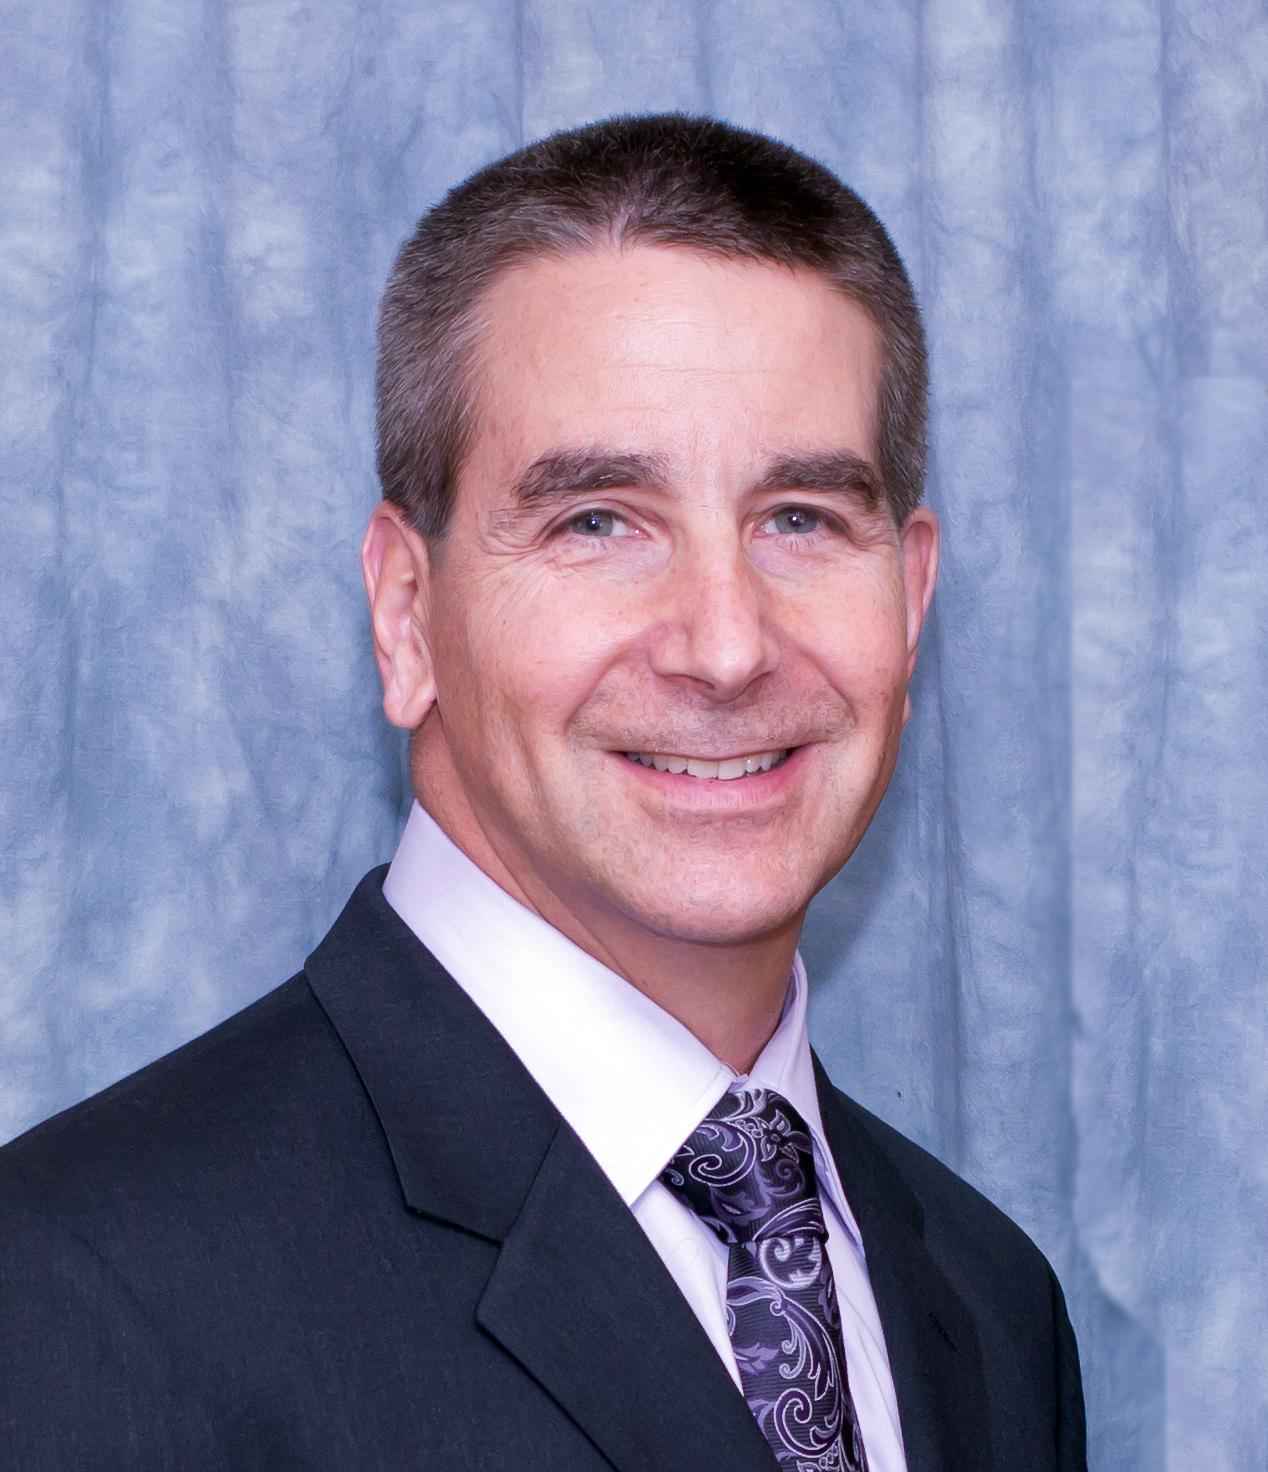 Dr. Jeffry Gerber, MD, FAAFP